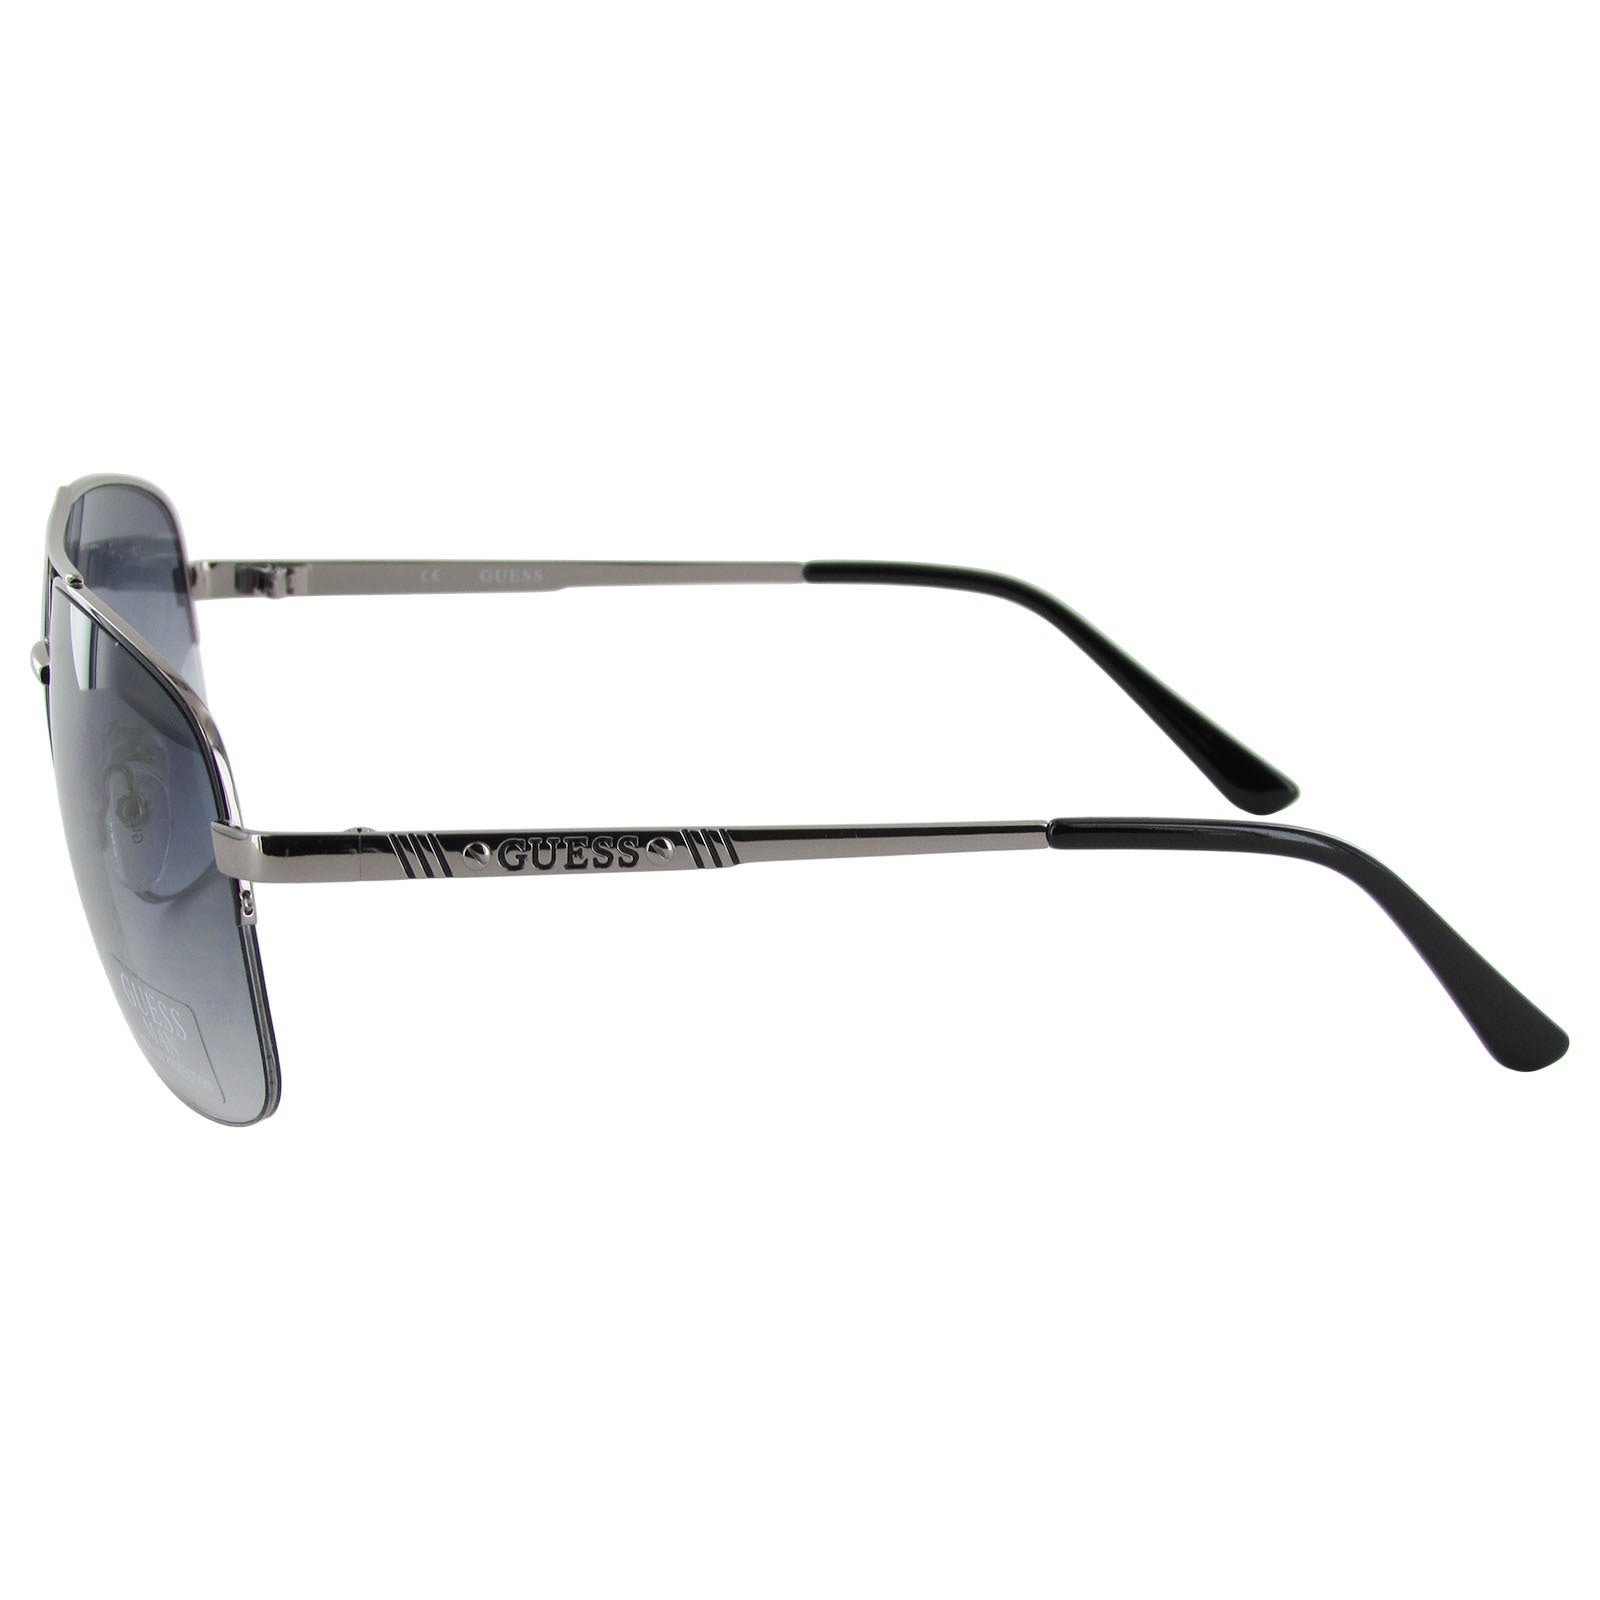 60b03be40e Shop Guess Aviator GU6745 Gunmetal Frame Smoke 60 mm Lens Sunglasses - Free  Shipping On Orders Over  45 - Overstock - 14331182